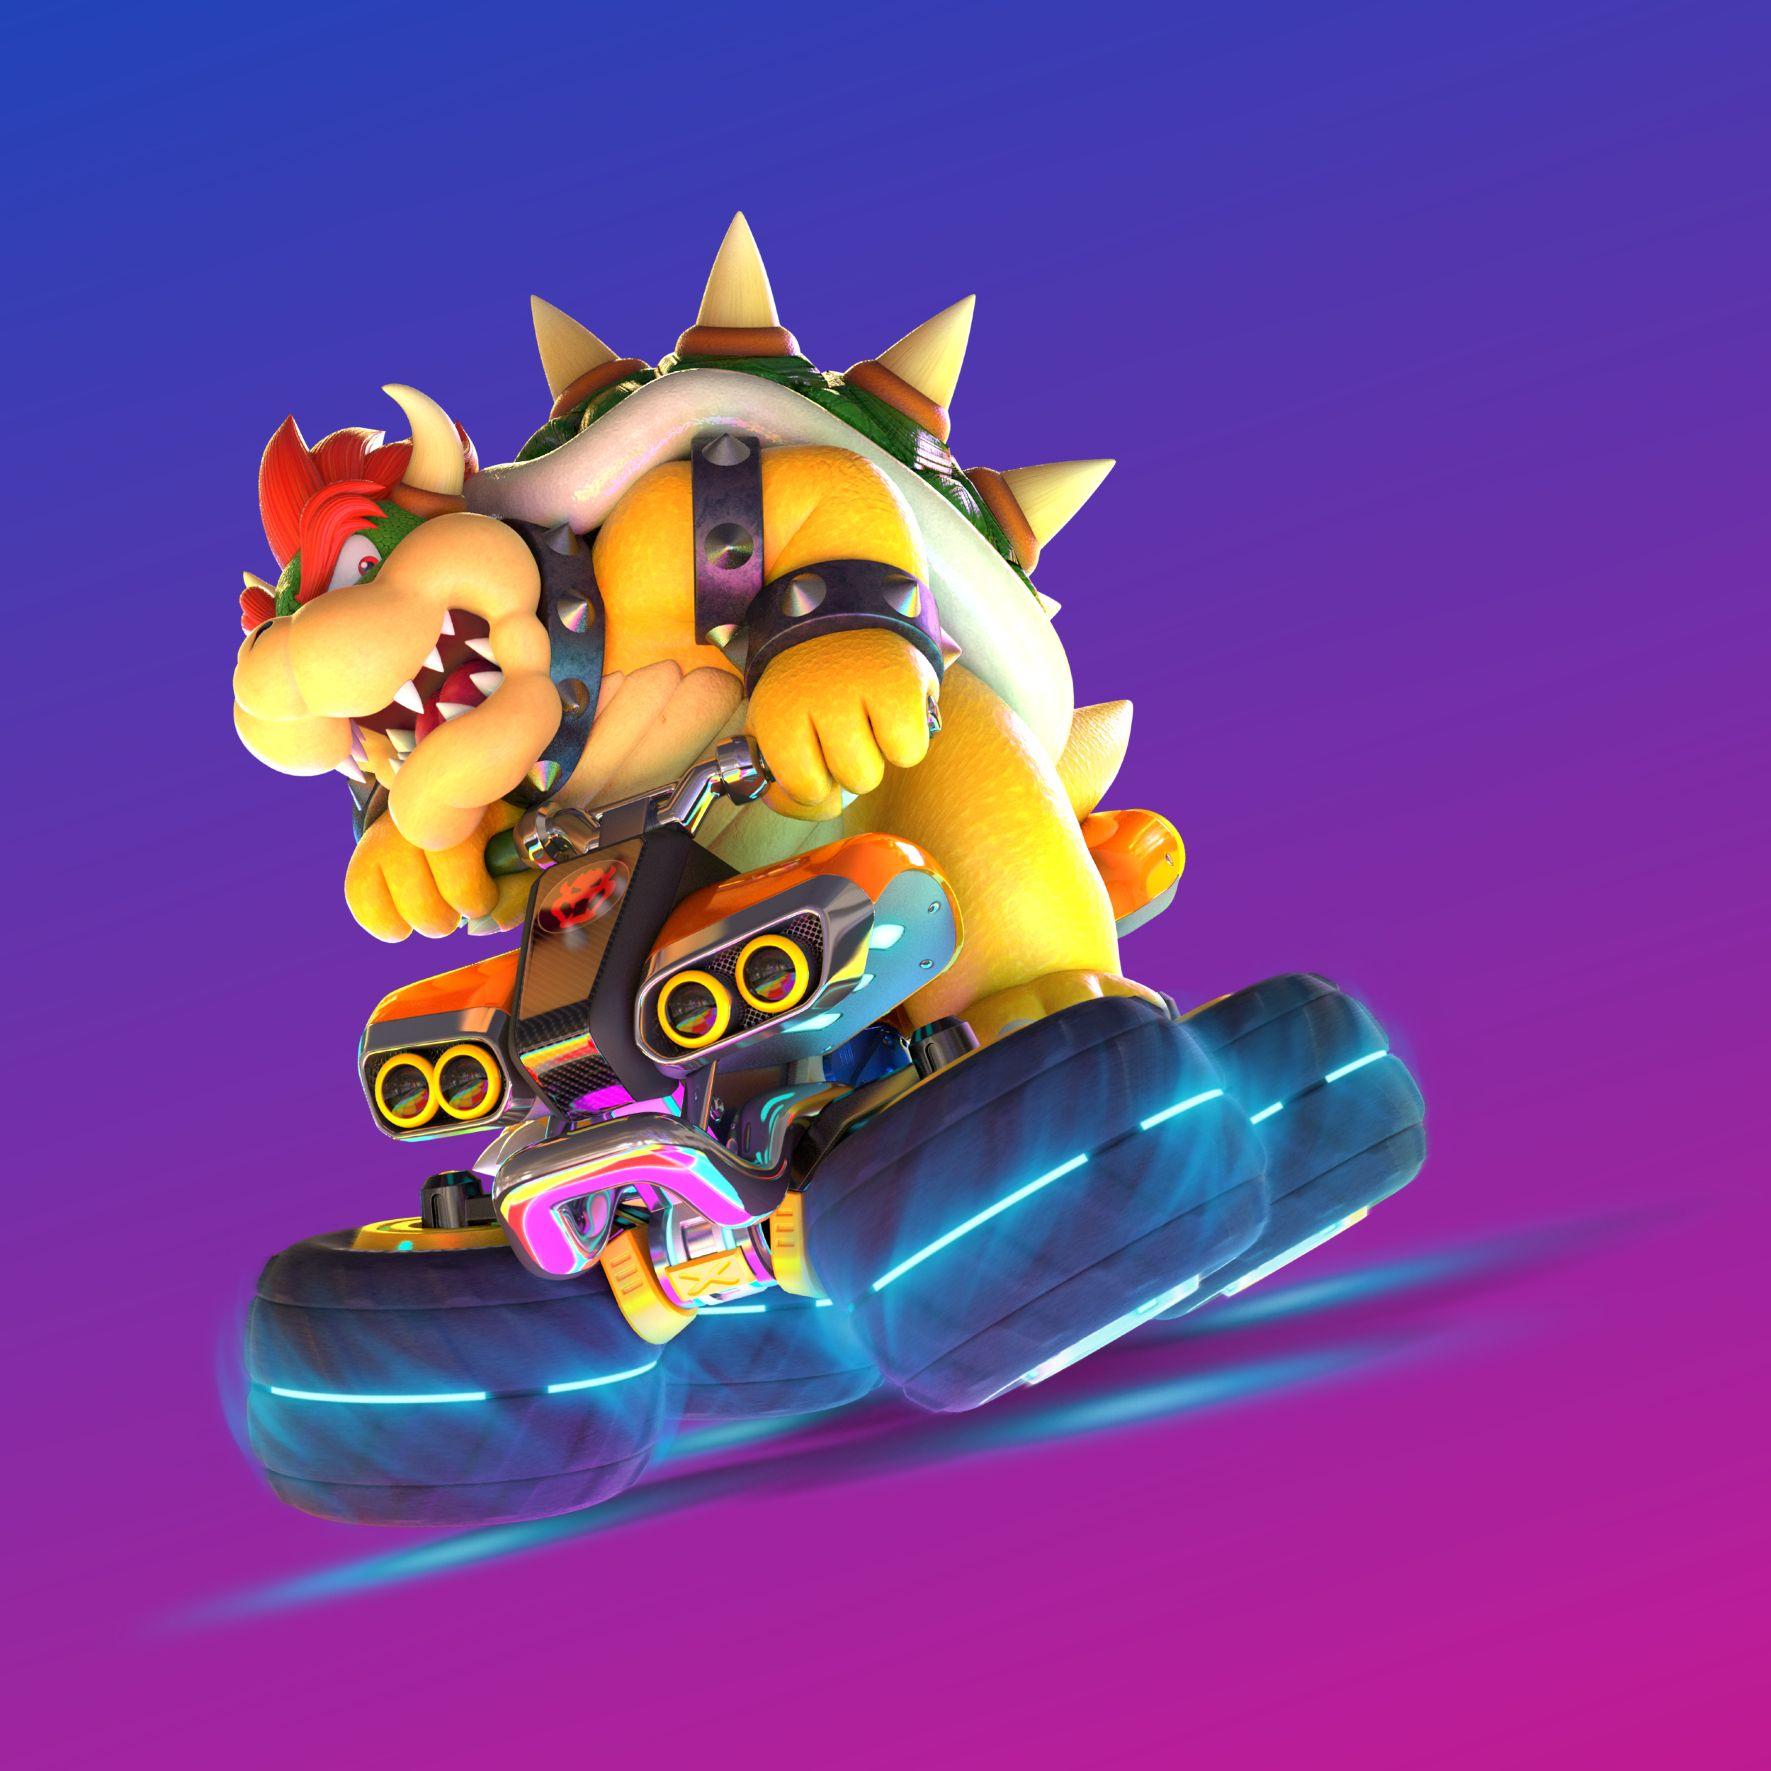 Mario Kart 8 Deluxe Hd Artwork Mario Kart 8 Wii U Mario Kart